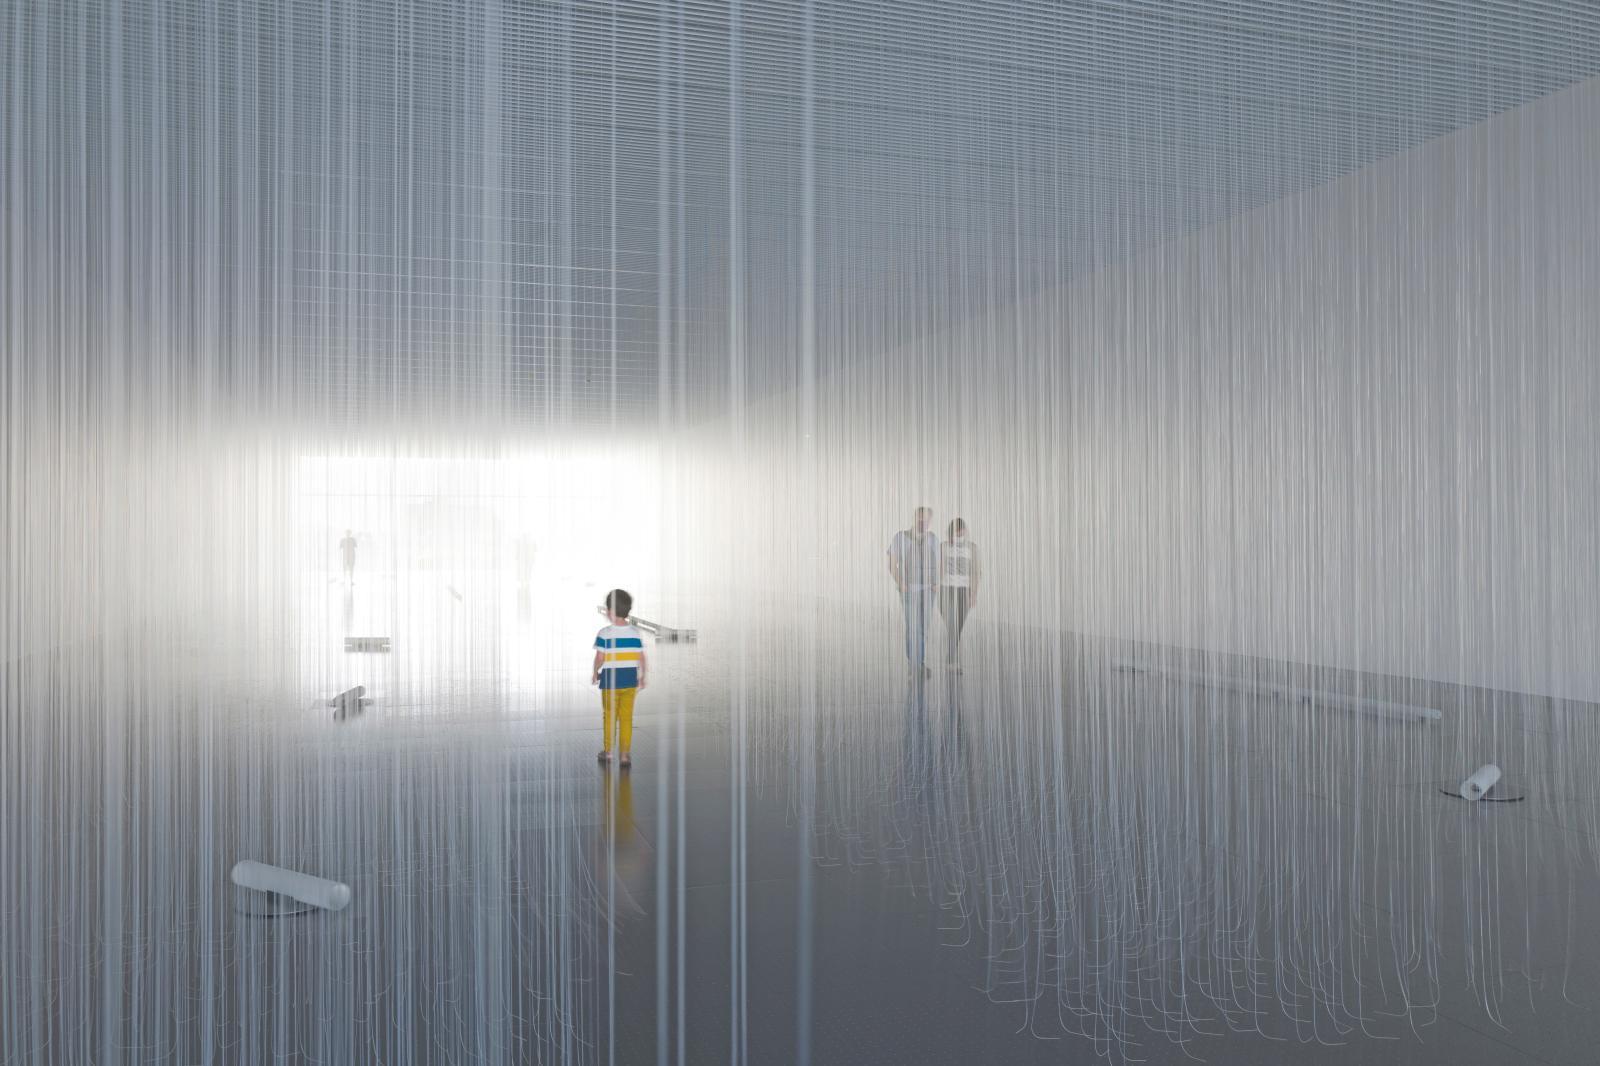 Frémissements, 2020, Centre Pompidou-Metz. © Susanna Fritscher, Laurent Tessier